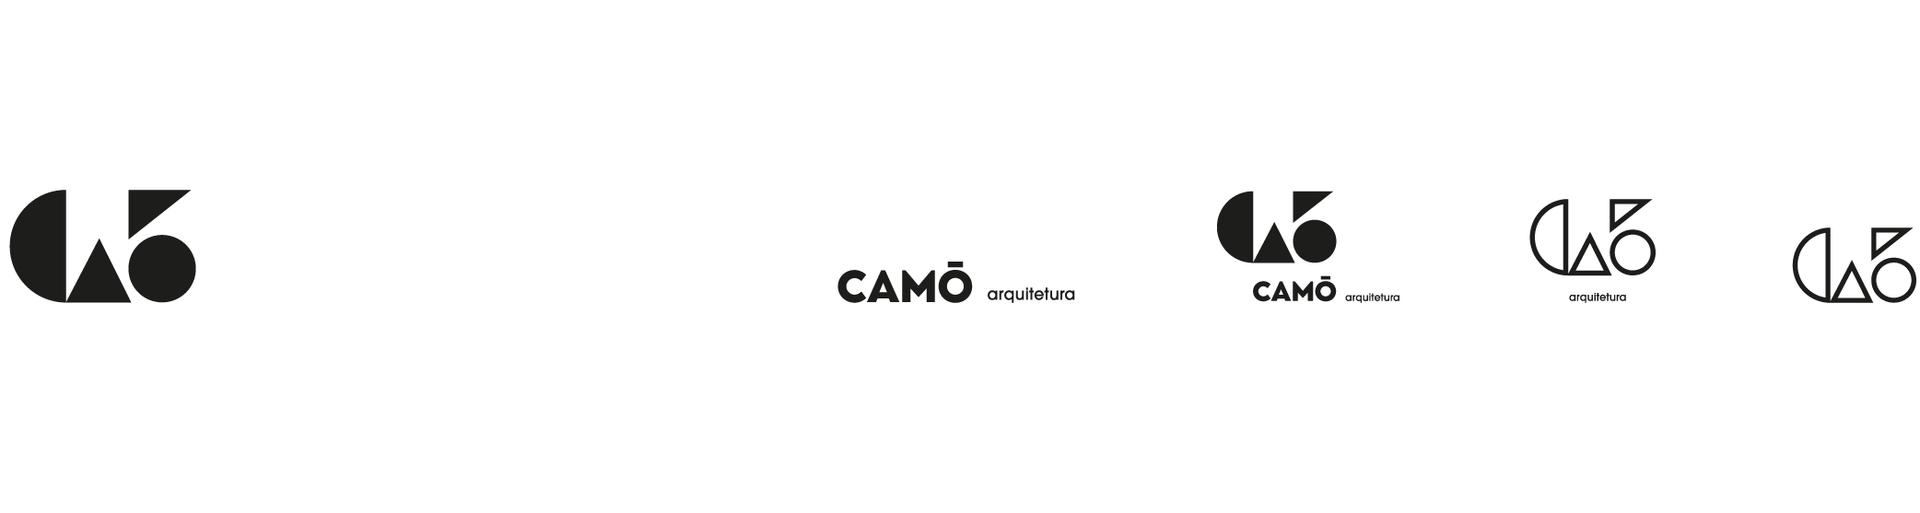 apoc_studio_gustavo_francesconi_logos_65